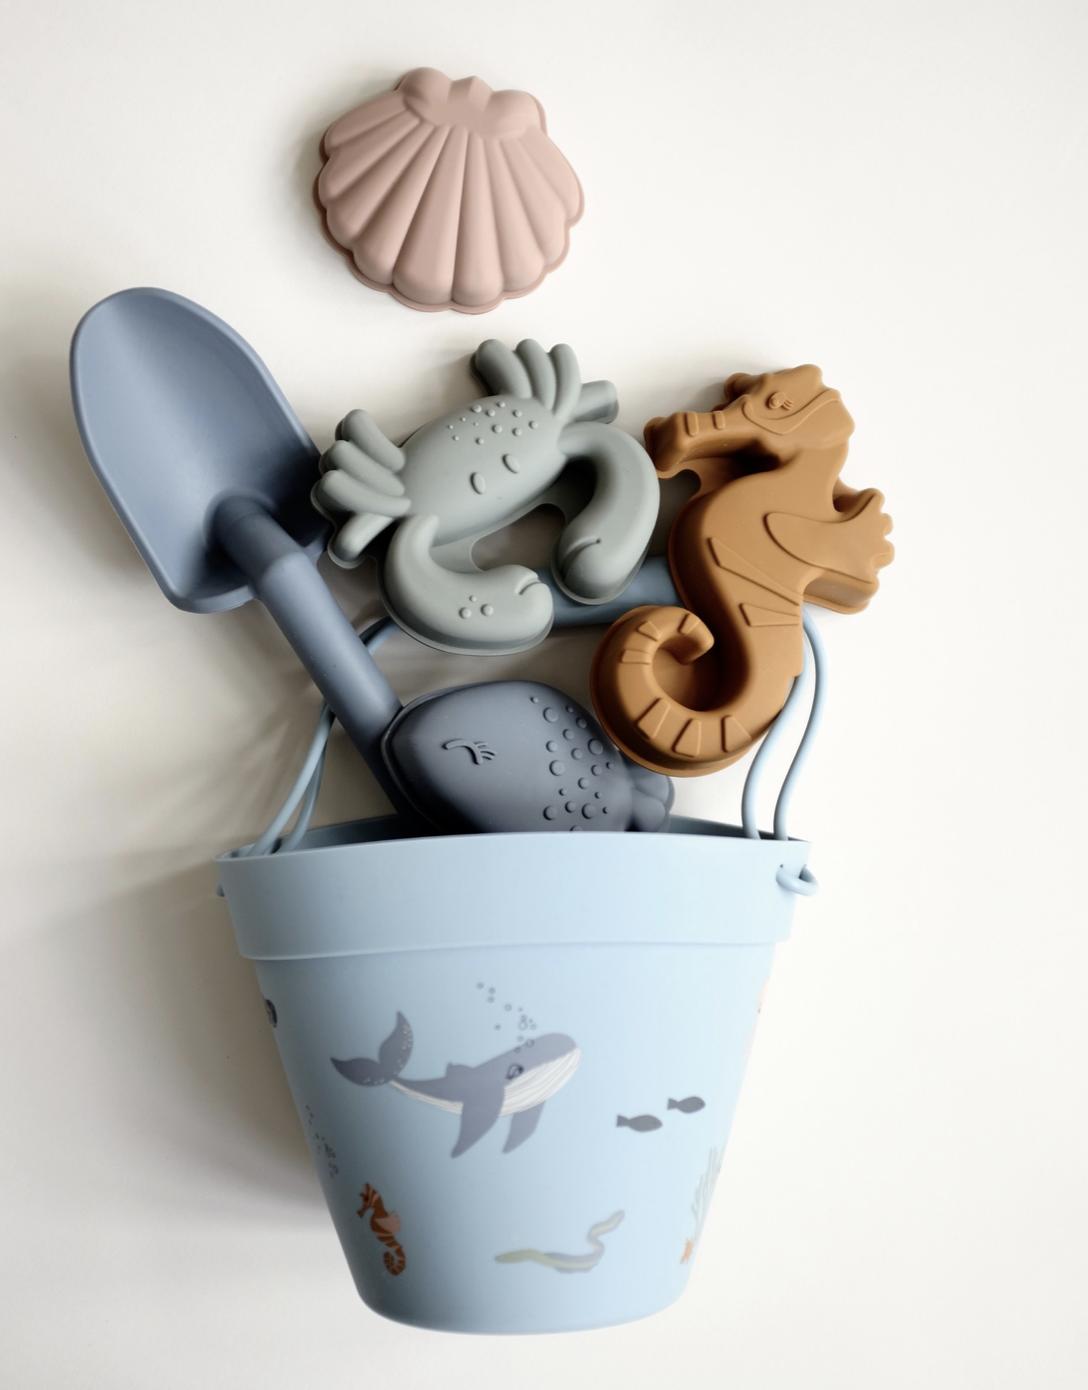 Vandaag delen we mooi strandspeelgoed bij Kinderfavorites. Heel leuk speelgoed van goede kwaliteit. Ook mooi om cadeau te doen.